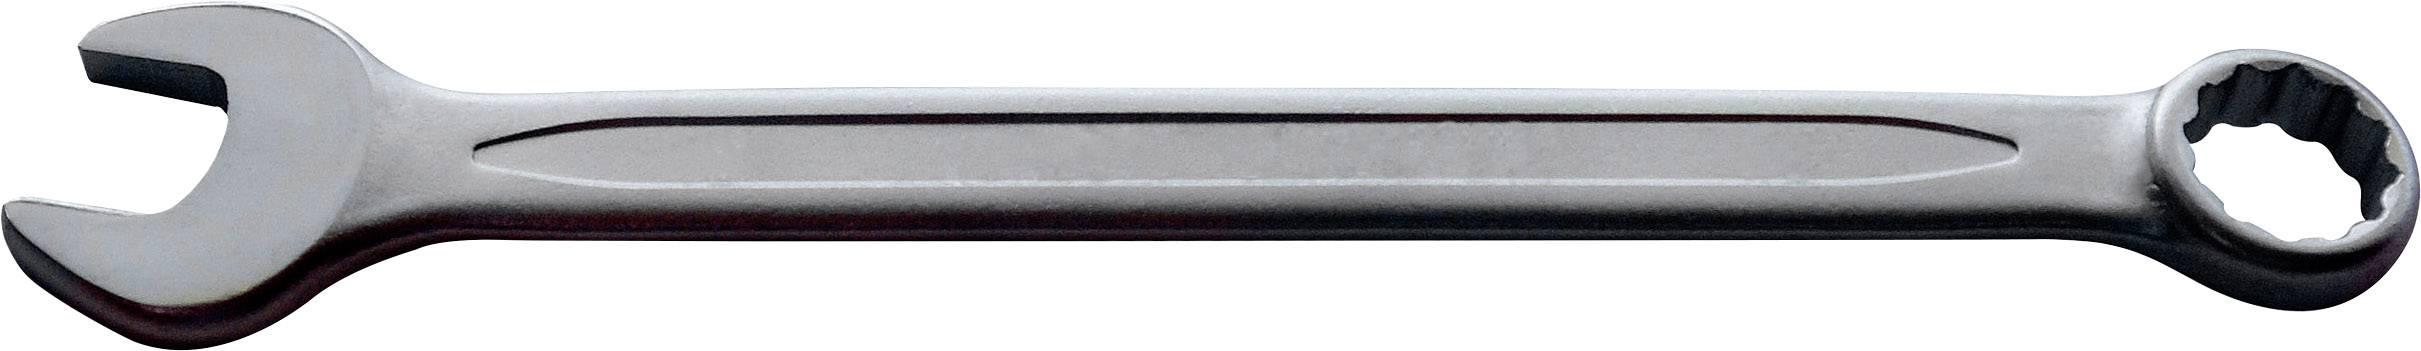 Očkoplochý kľúč/e TOOLCRAFT 820836, 13 mm